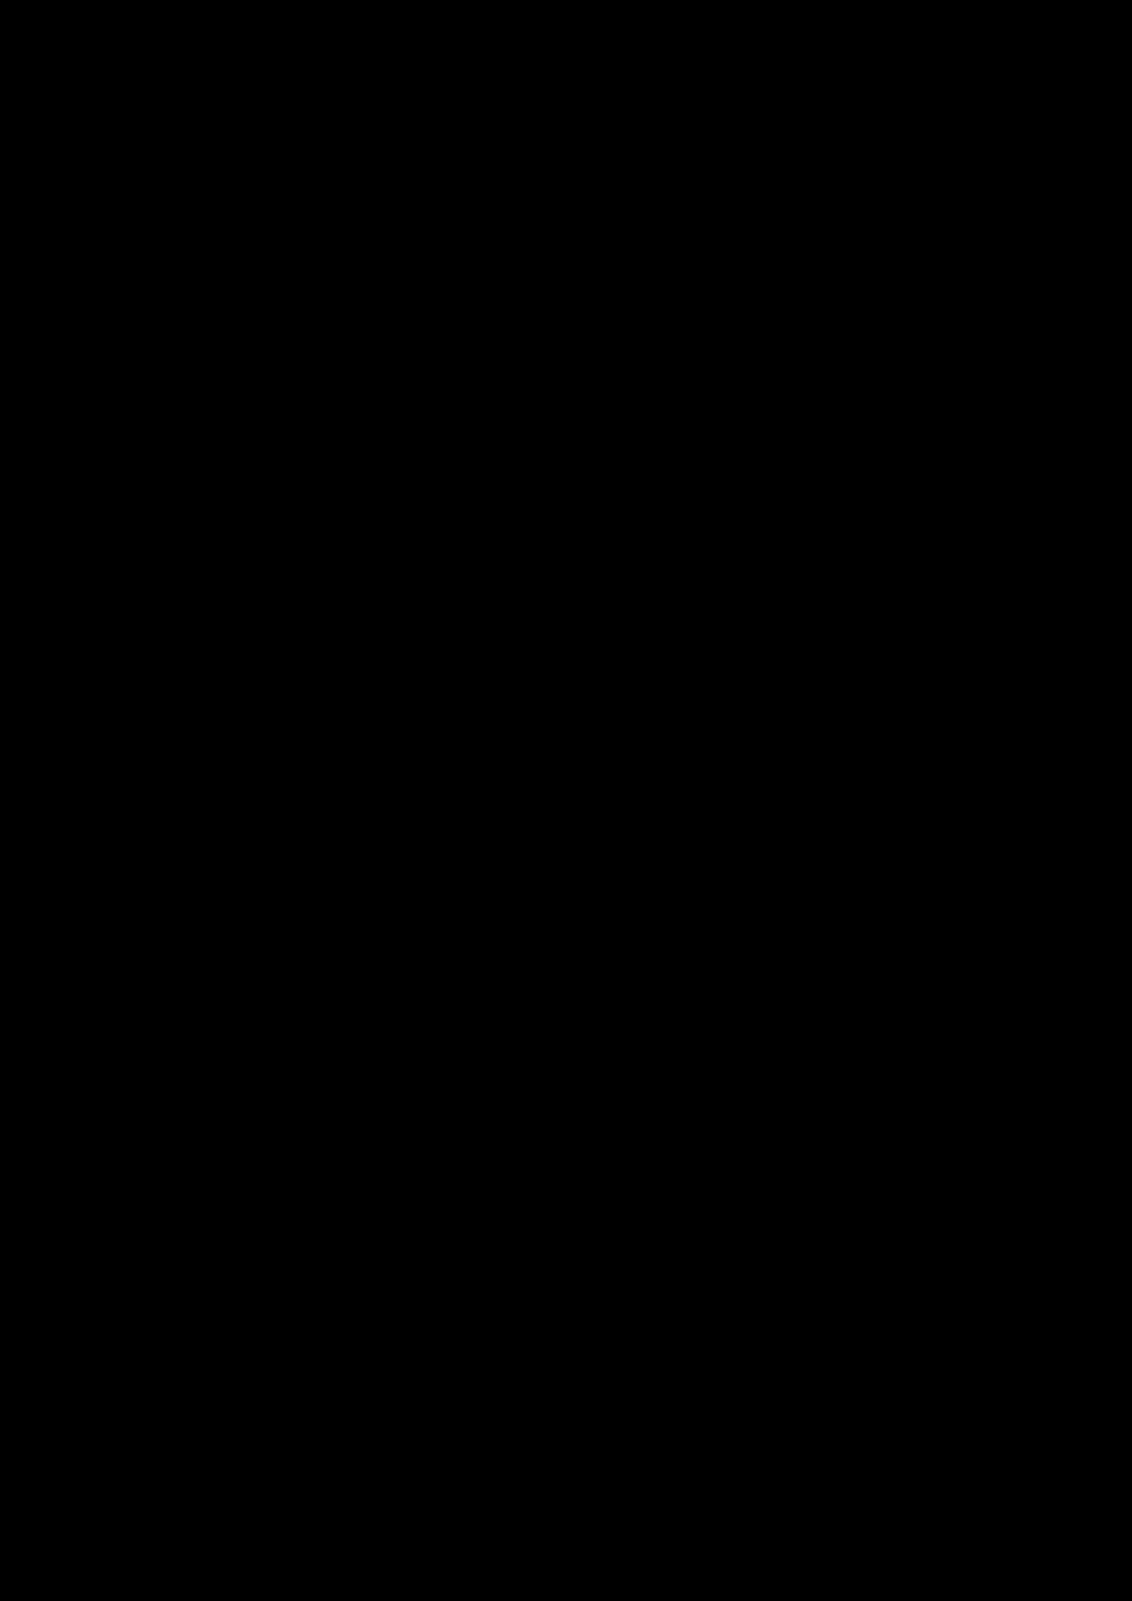 Ispoved Pervogo Boga slide, Image 9